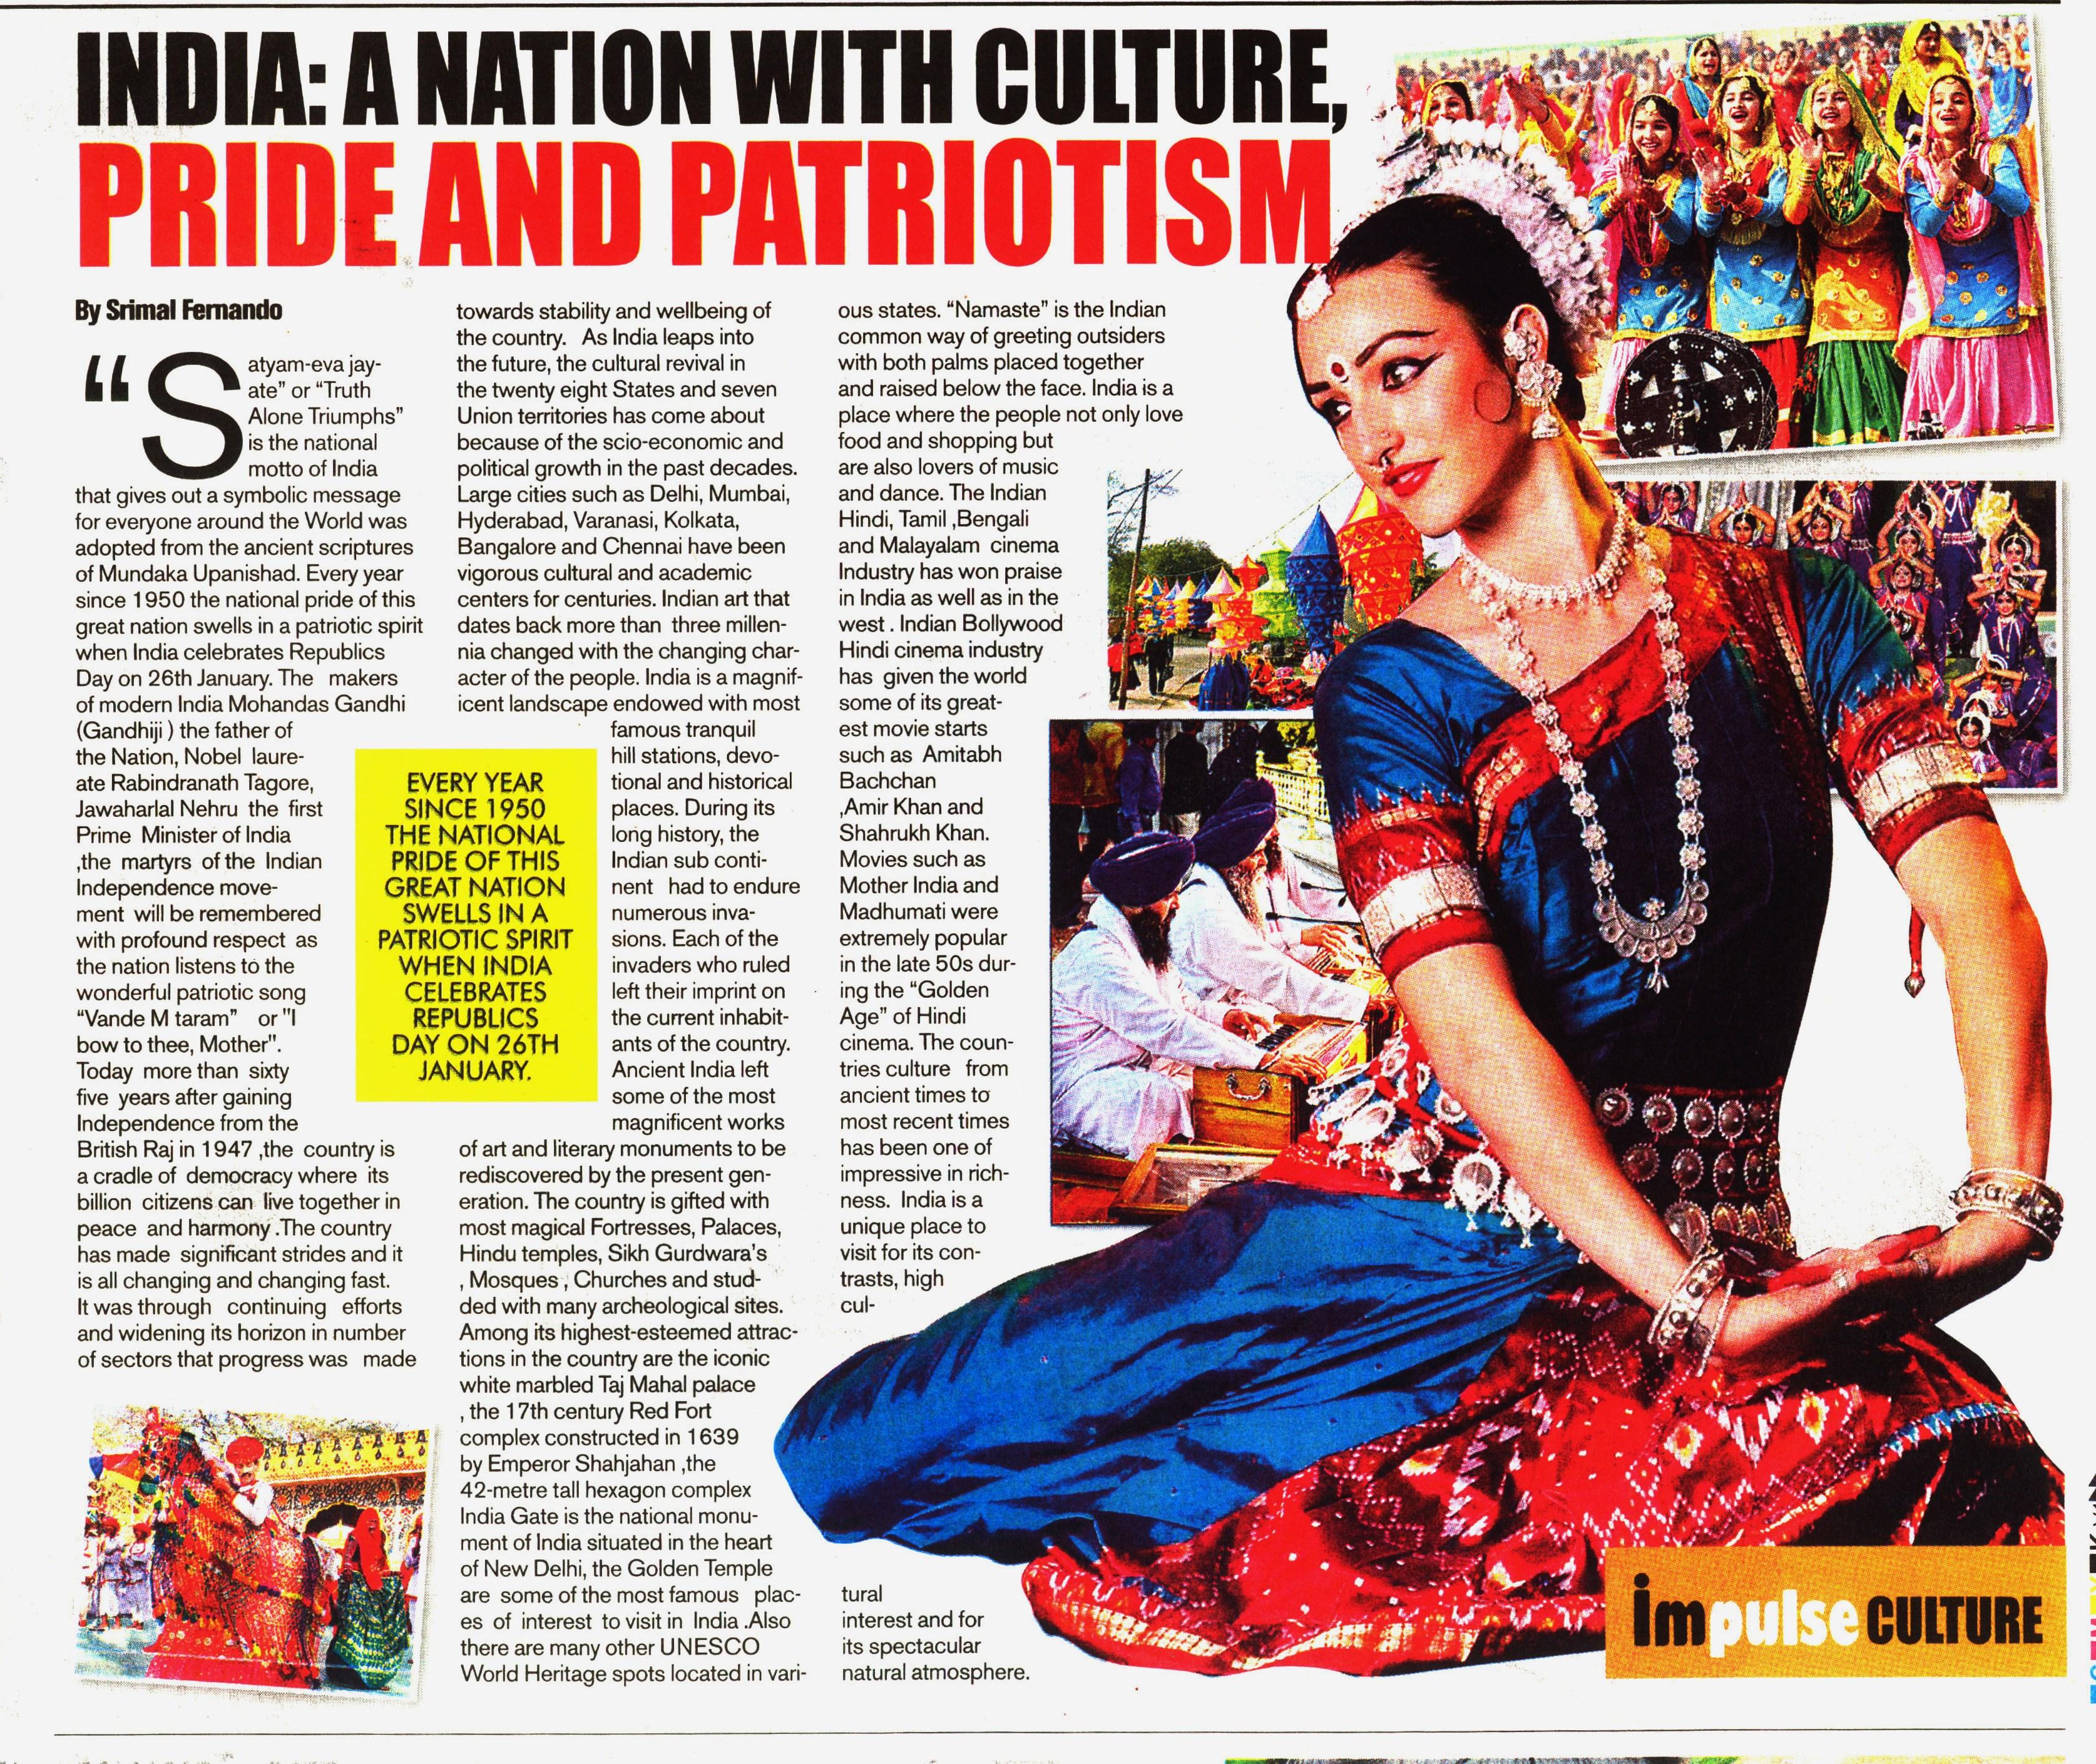 patriotism and national pride